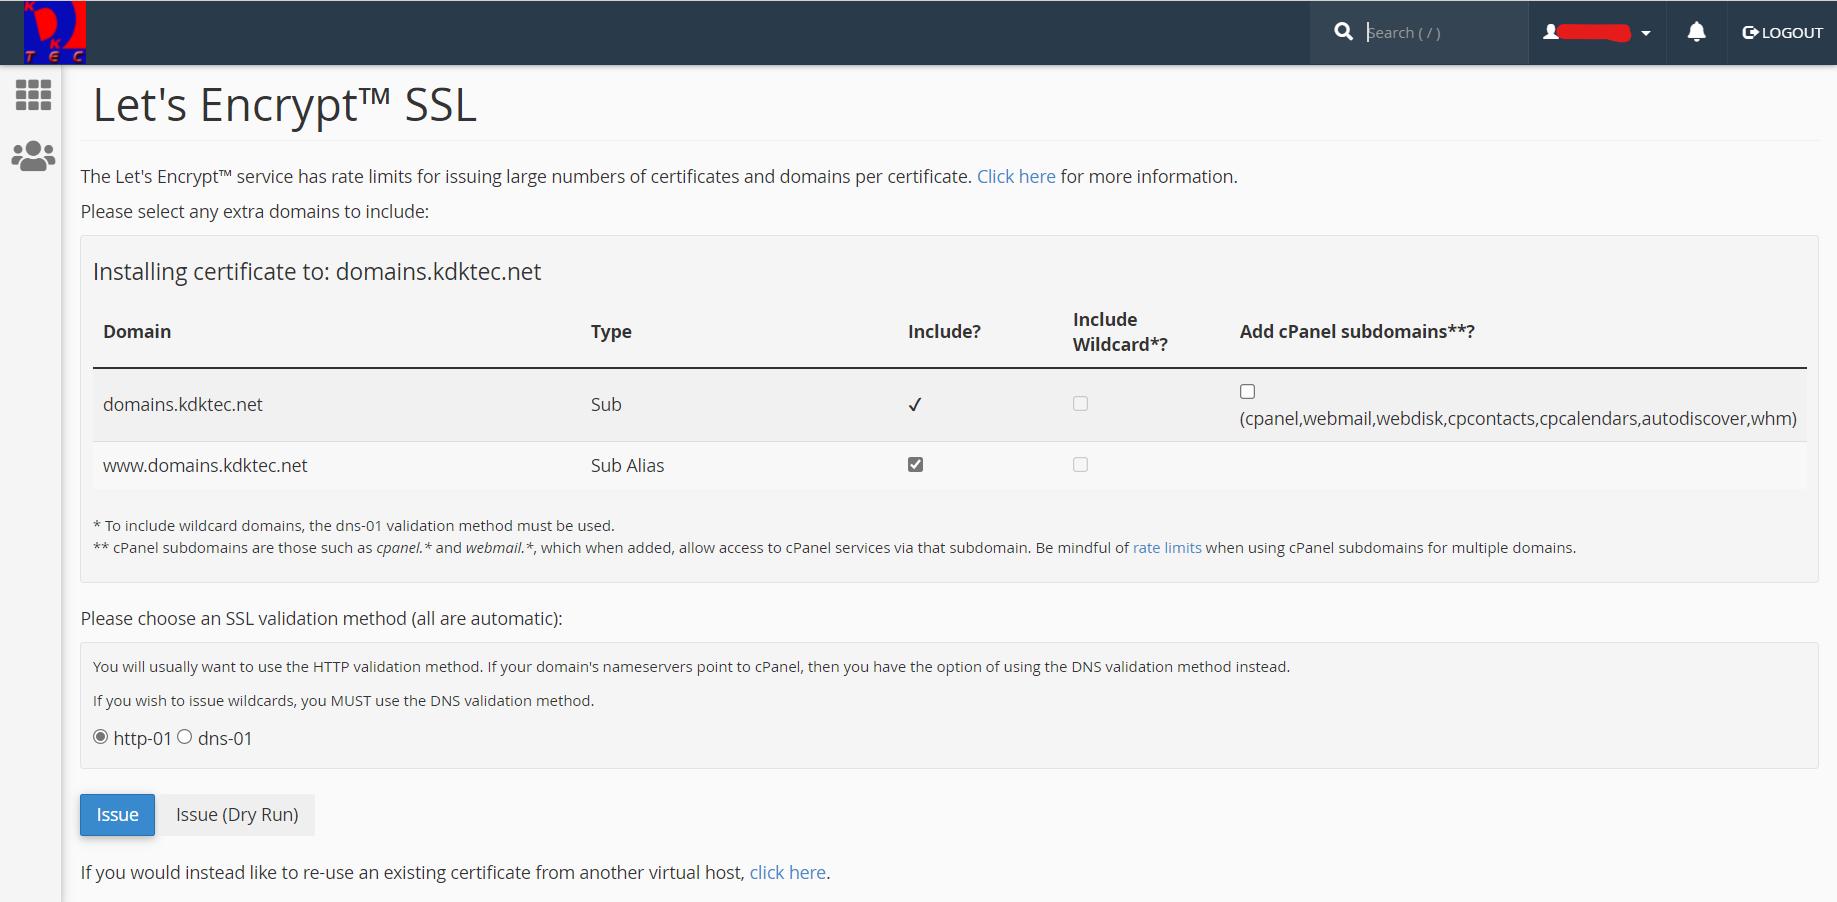 Let's Encrypt SSL certificate validation methods